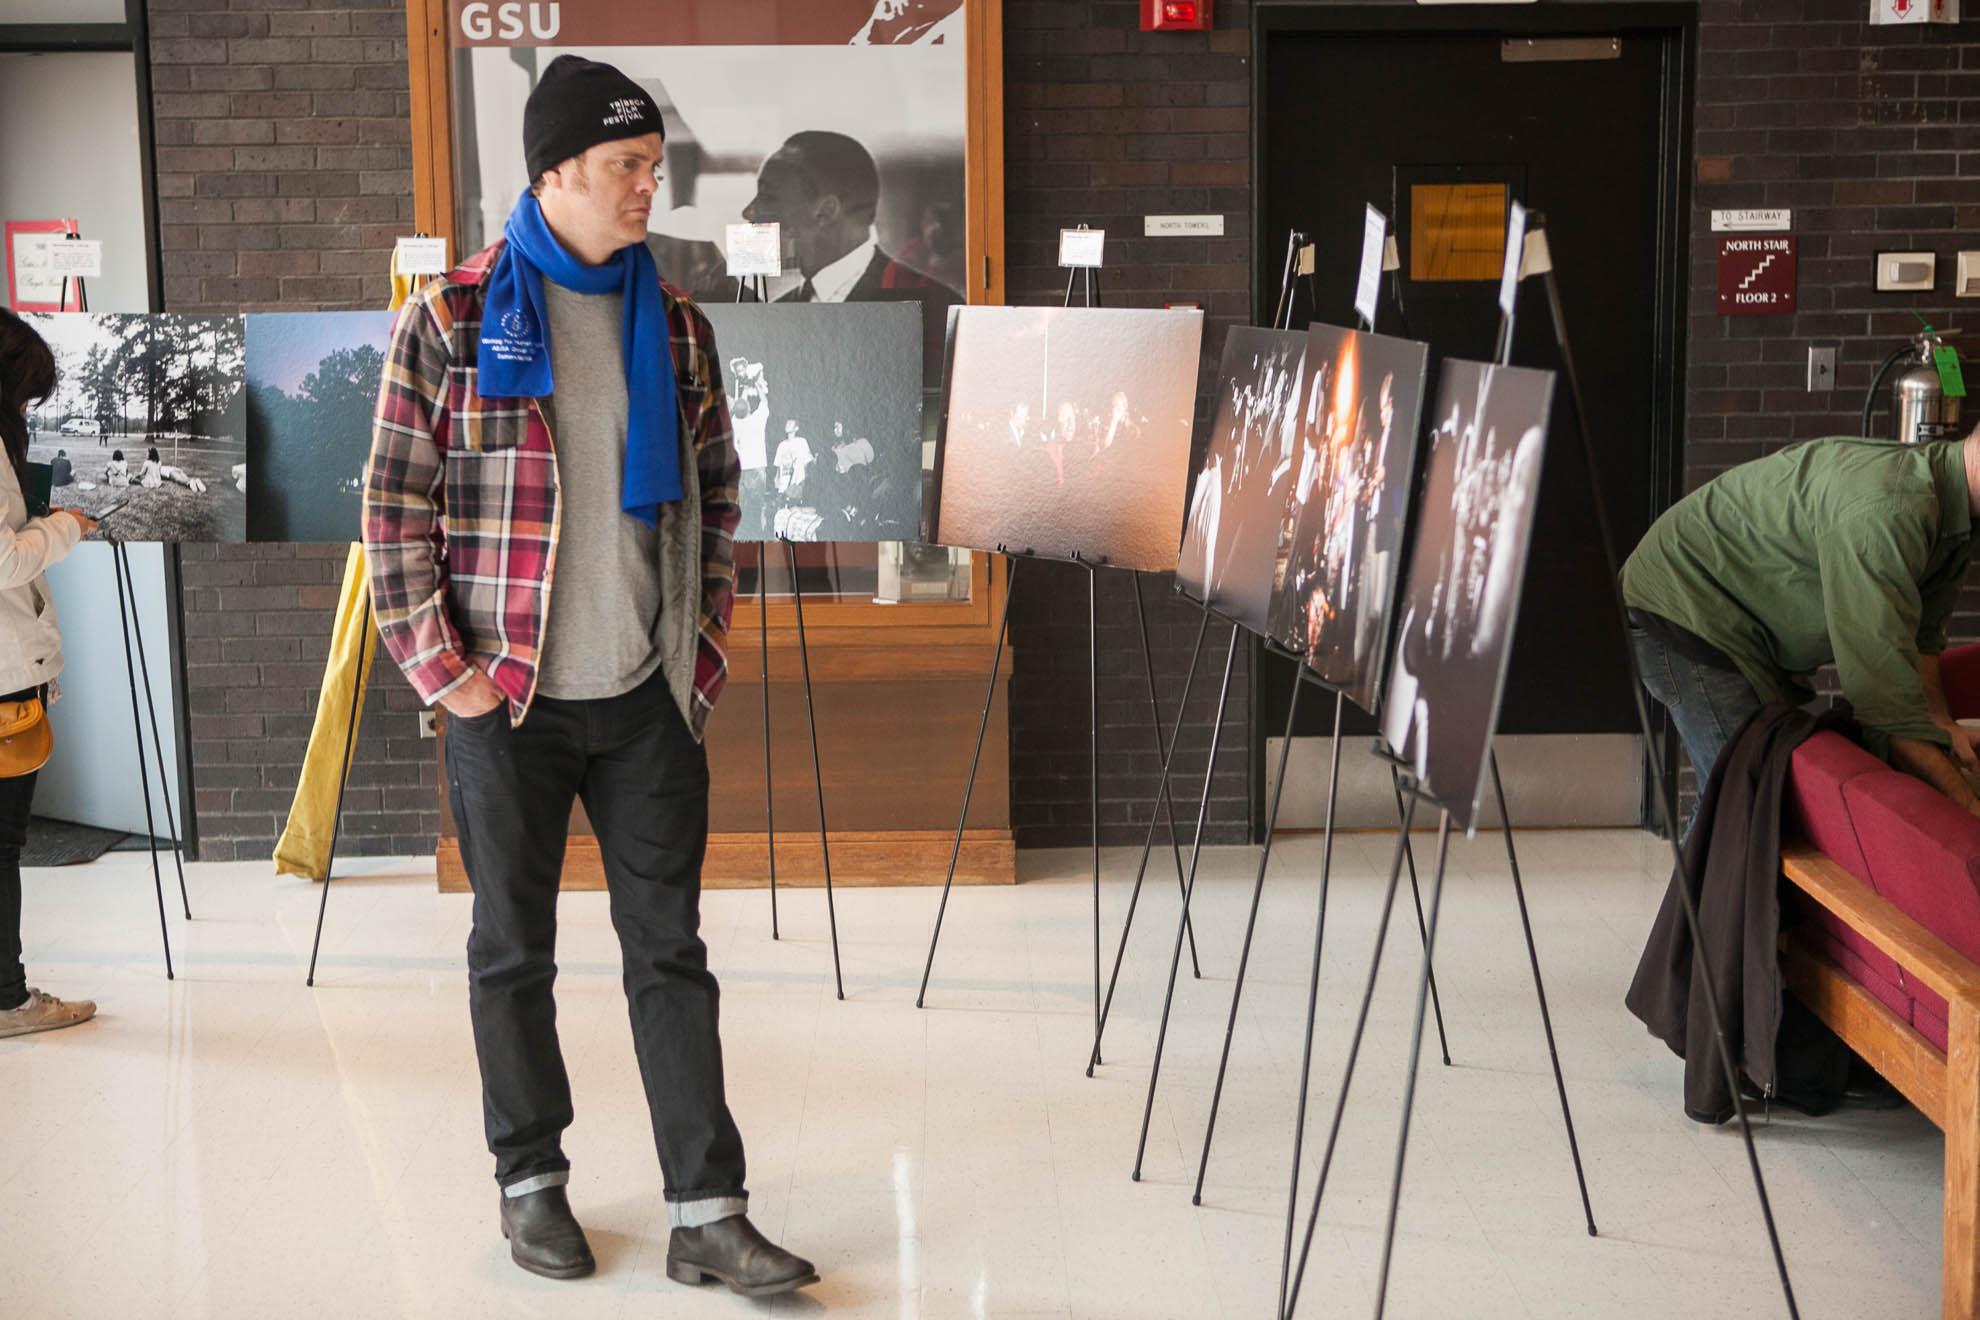 Actor Rainn Wilson views the photo exhibit at Boston University